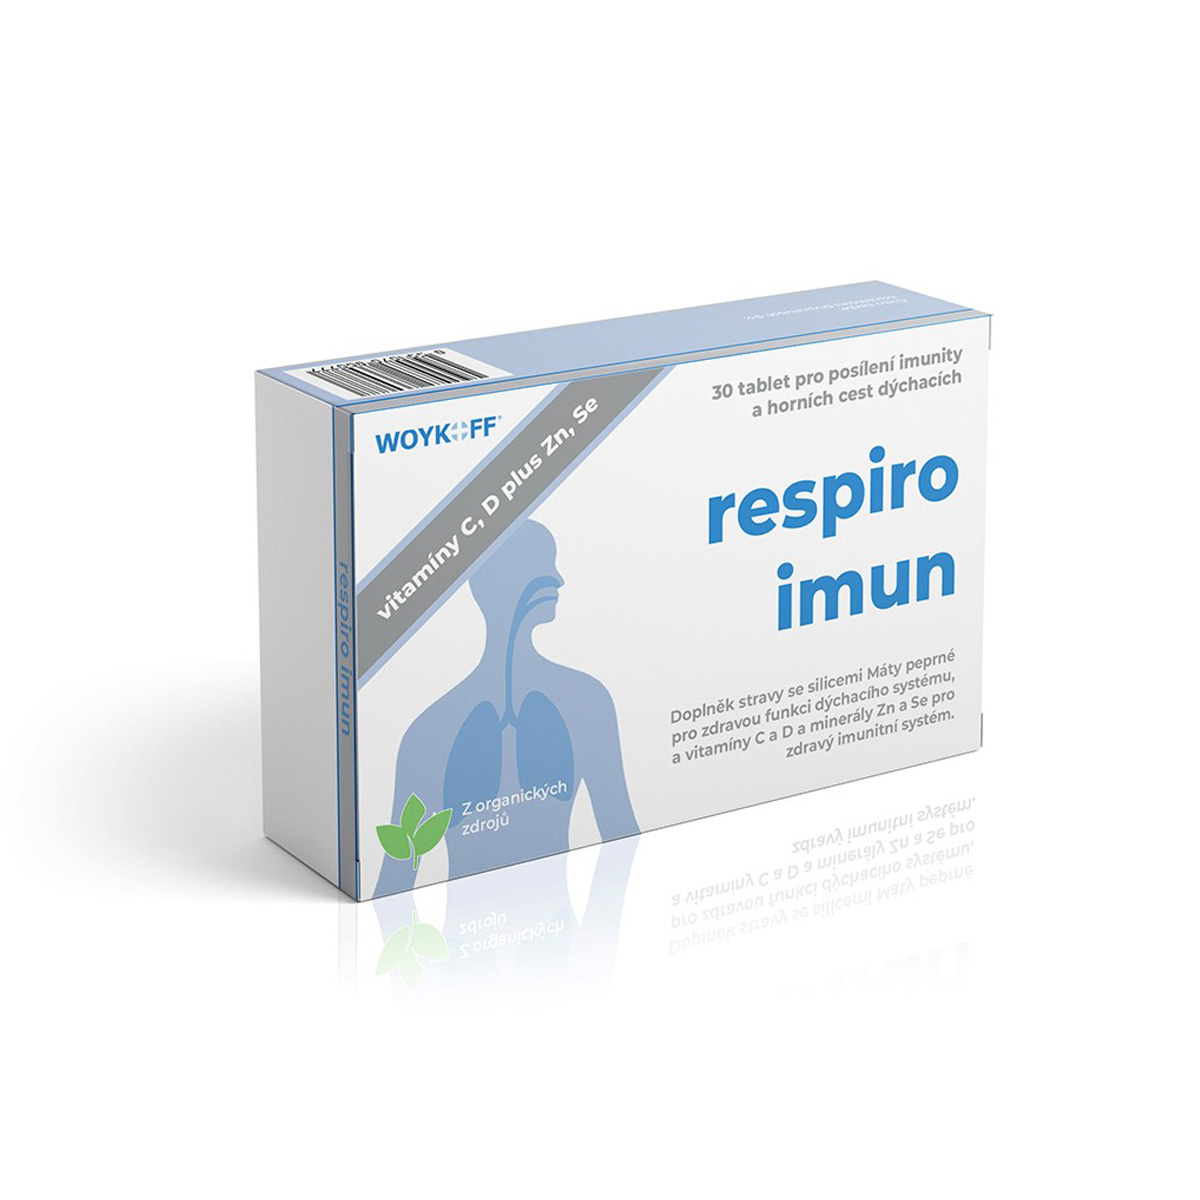 Woykoff respiro imun 30 tbl